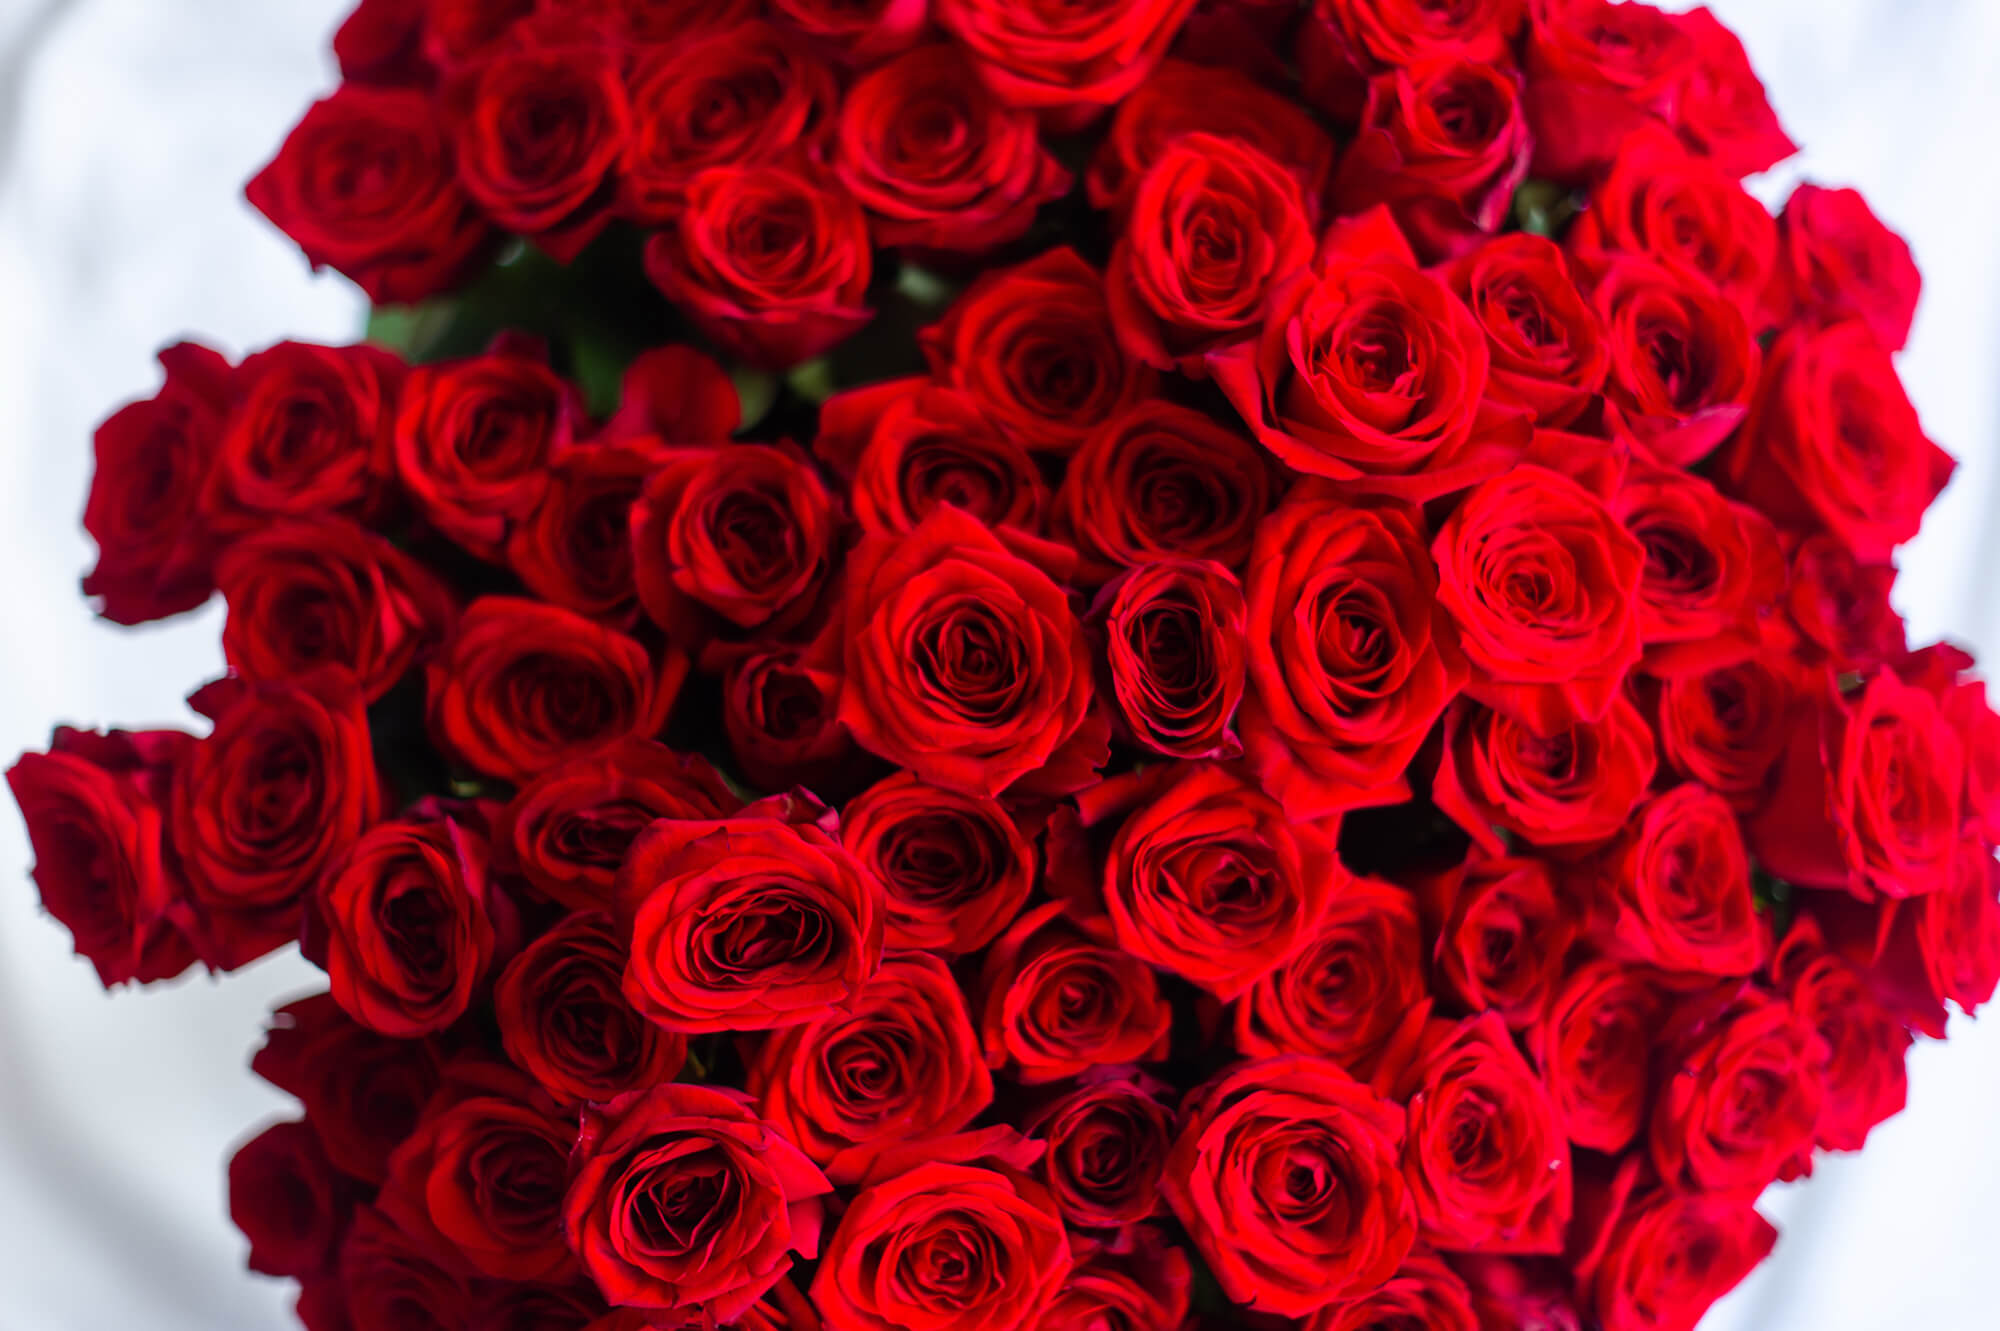 theflowershop-floresadomicilio-floresporsuscripcion-florespormembresia_bouquet_flores_bouquet_rosas_rojas